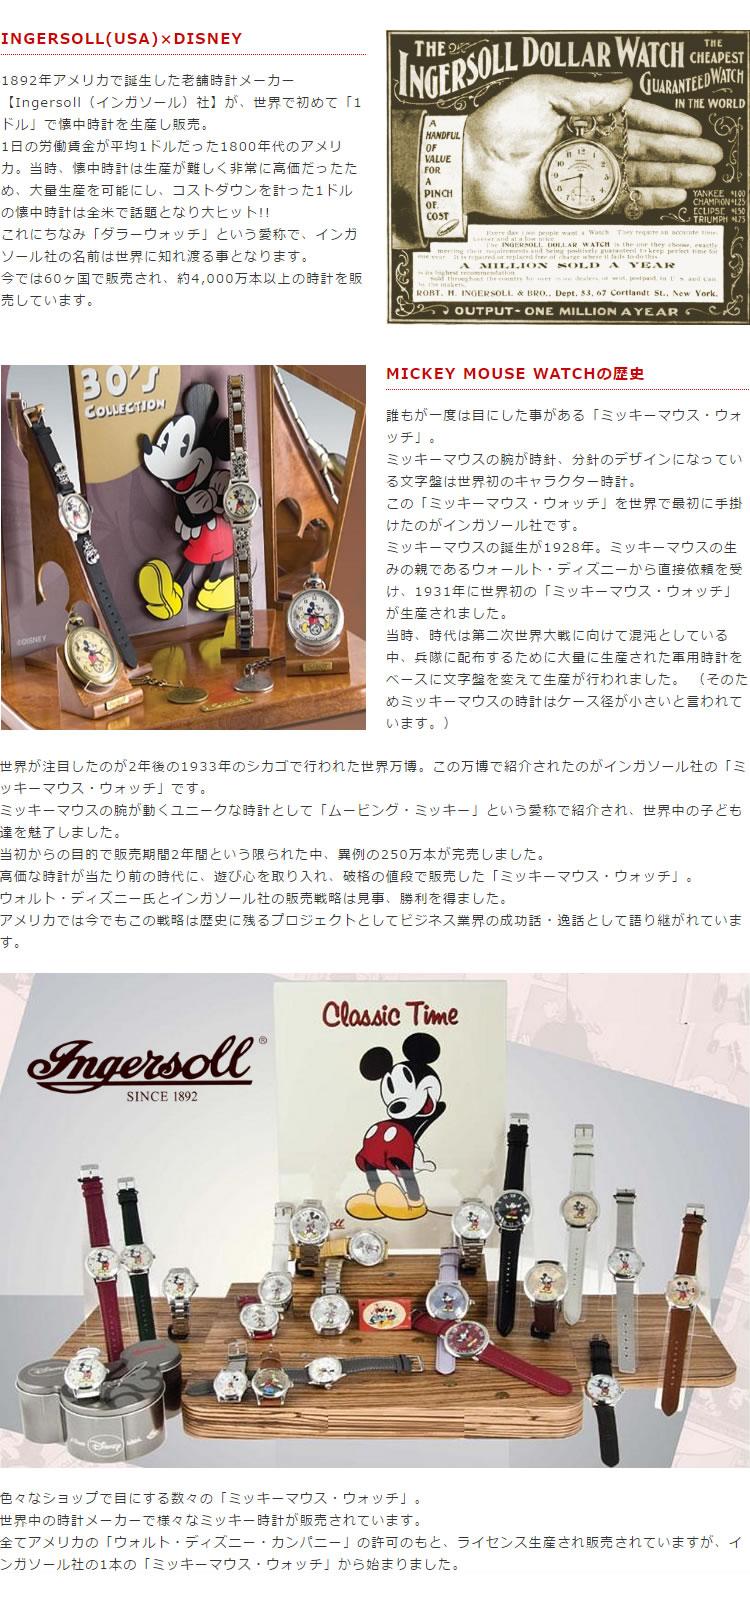 Ingersoll Disney 30